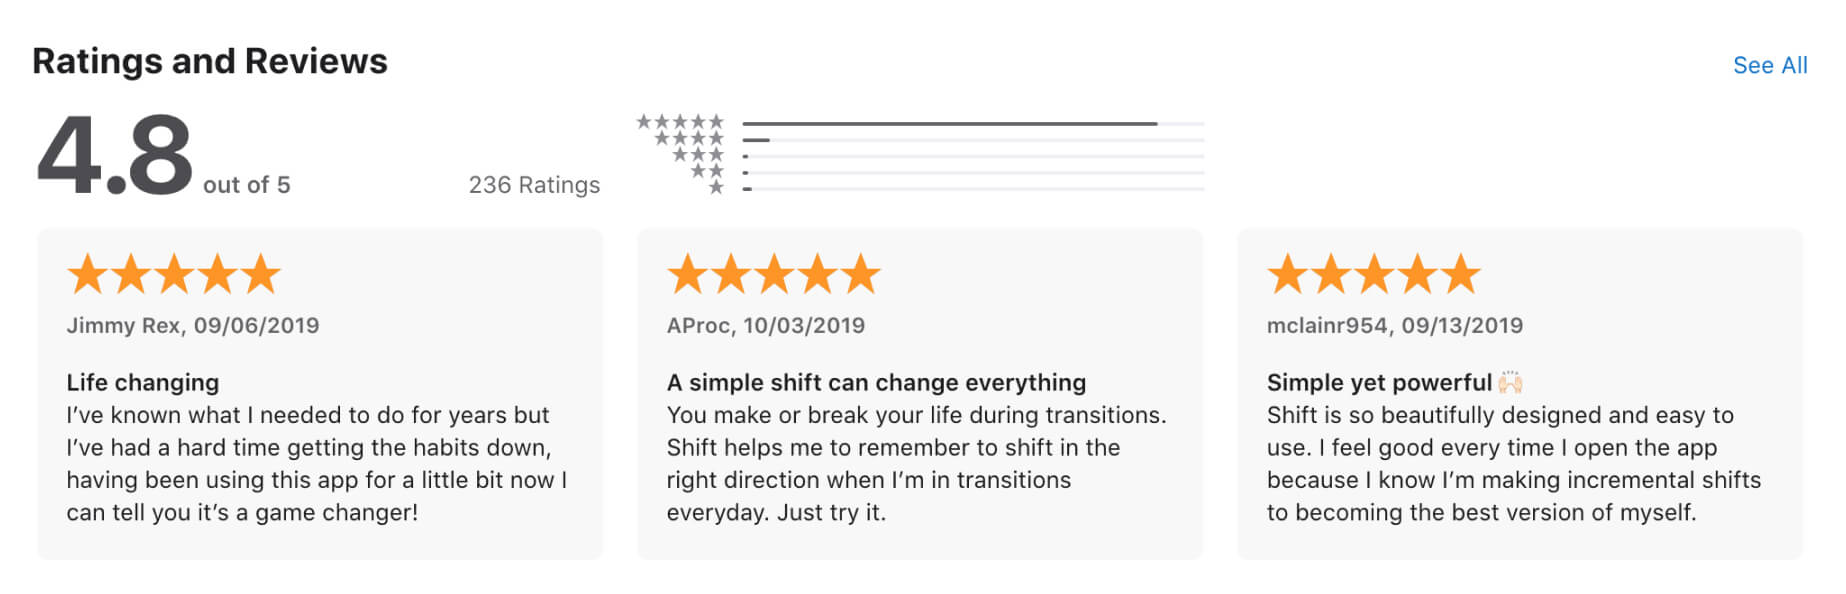 app store rating 5 stars